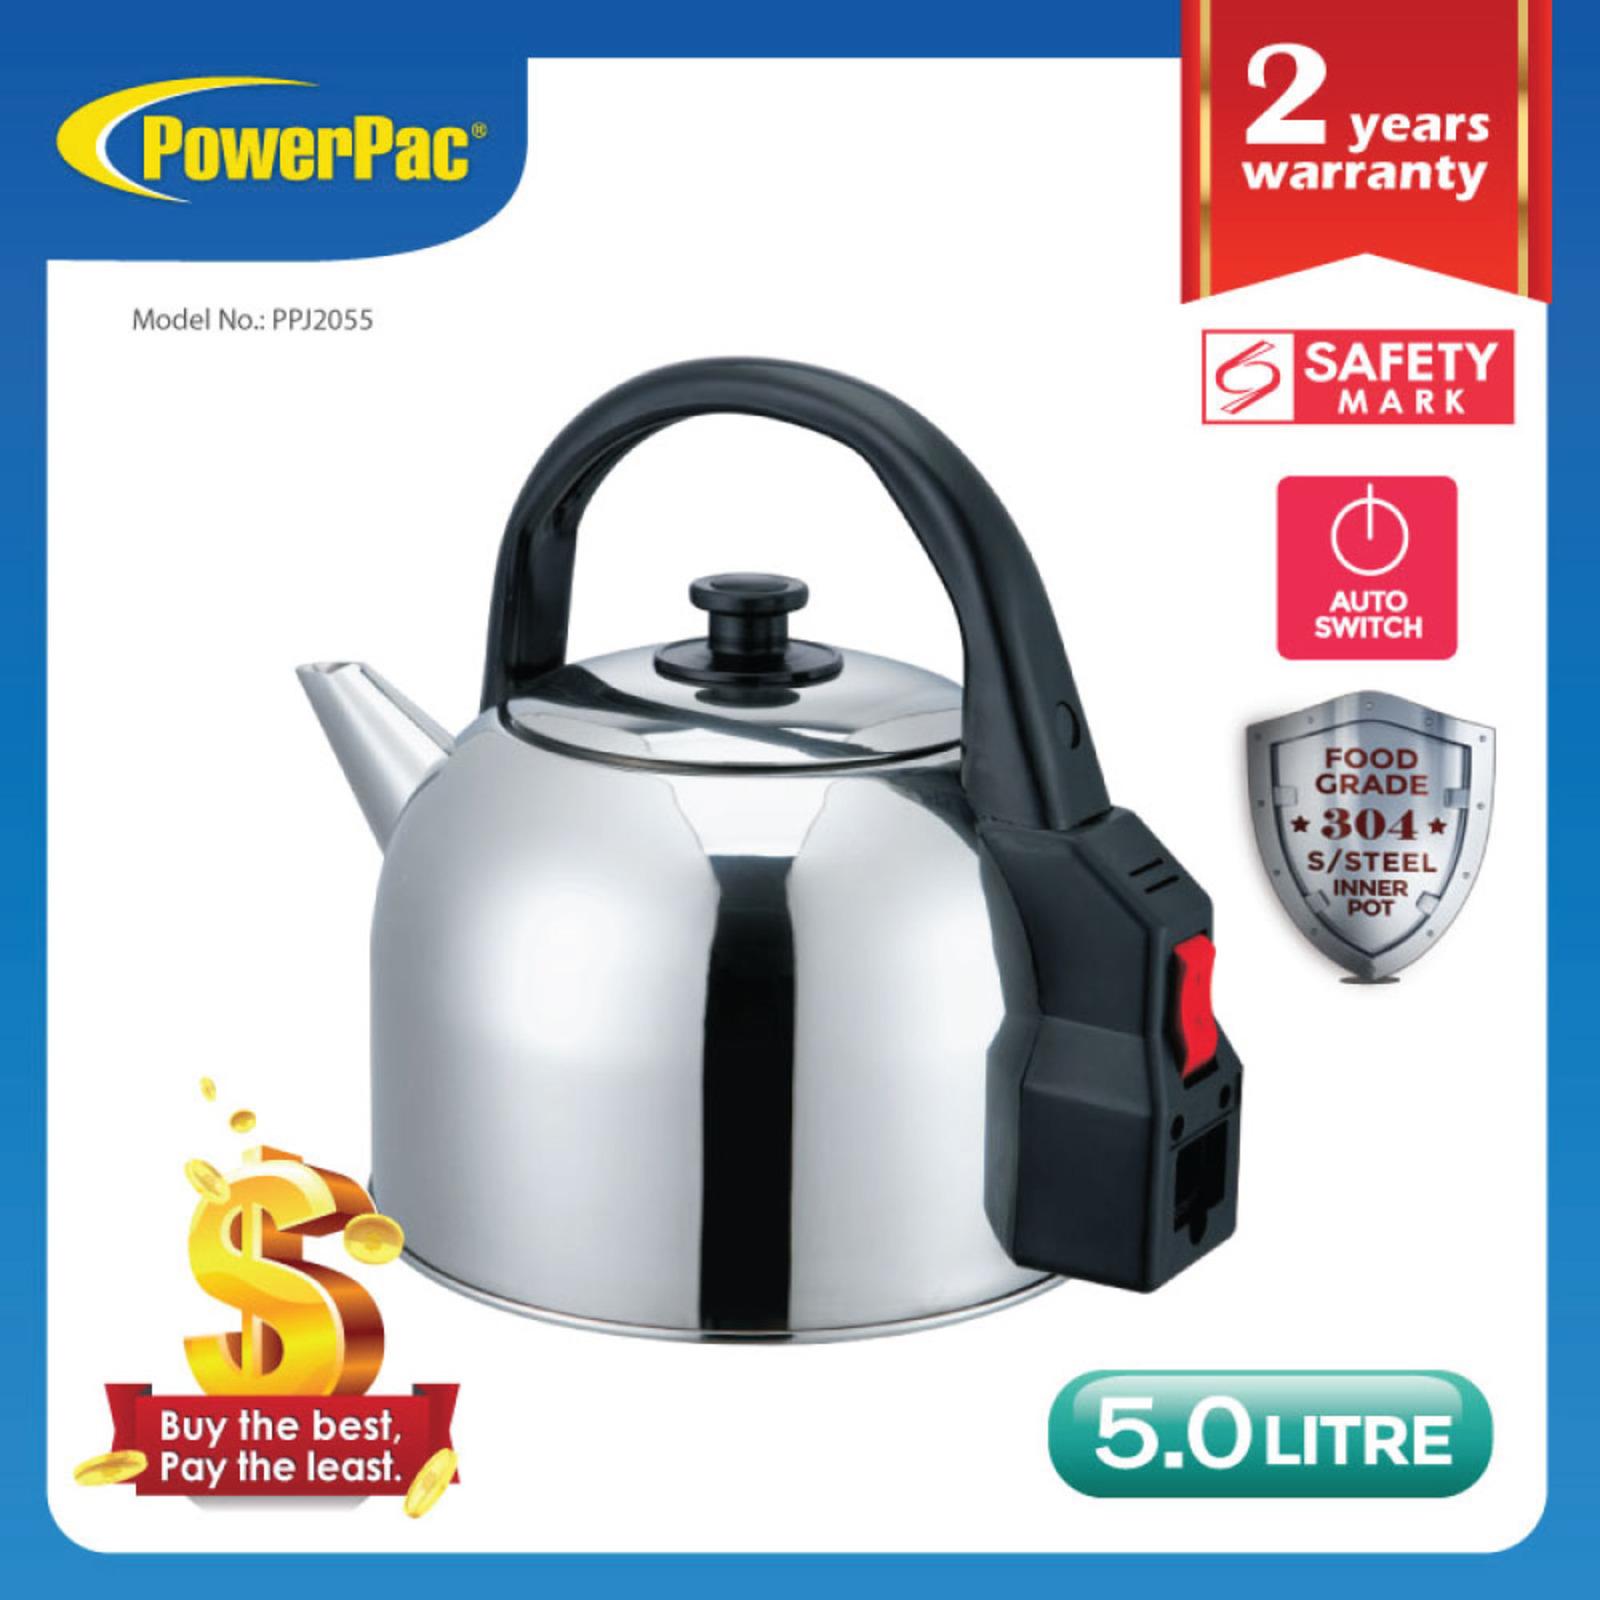 PowerPac (PPJ2055) 5.0L Electric Kettle